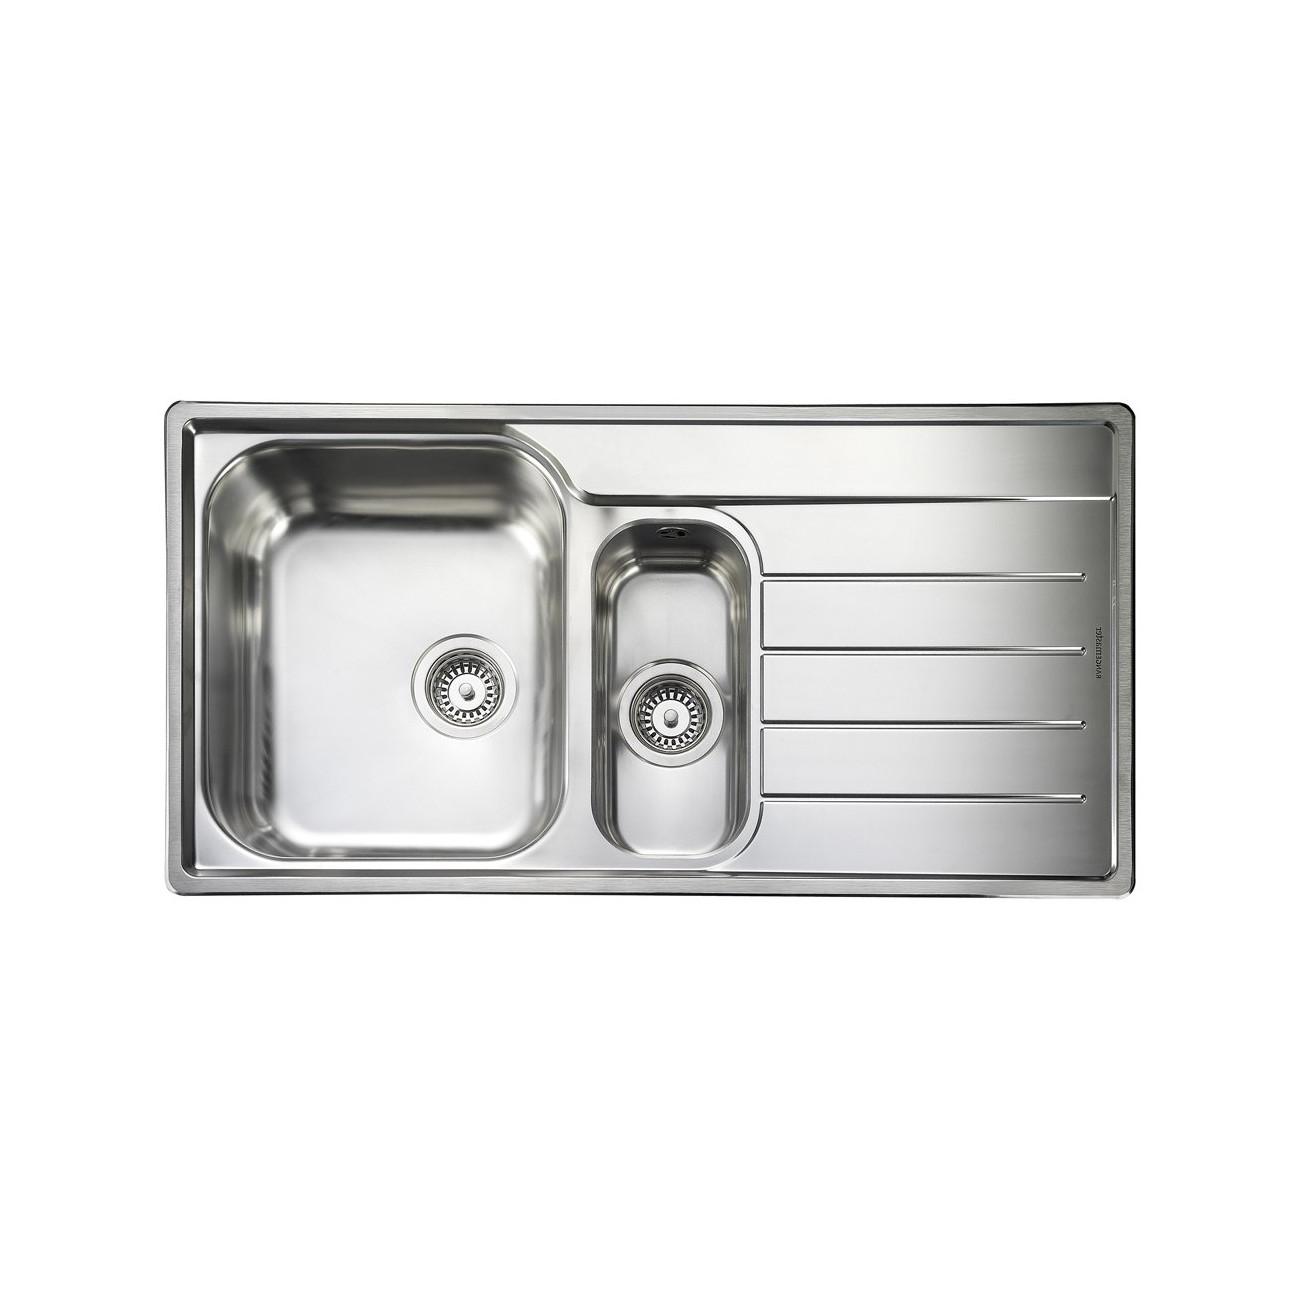 Rangemaster Oakland OL9852R/ 1.5 Bowl Stainless Steel Sink Right